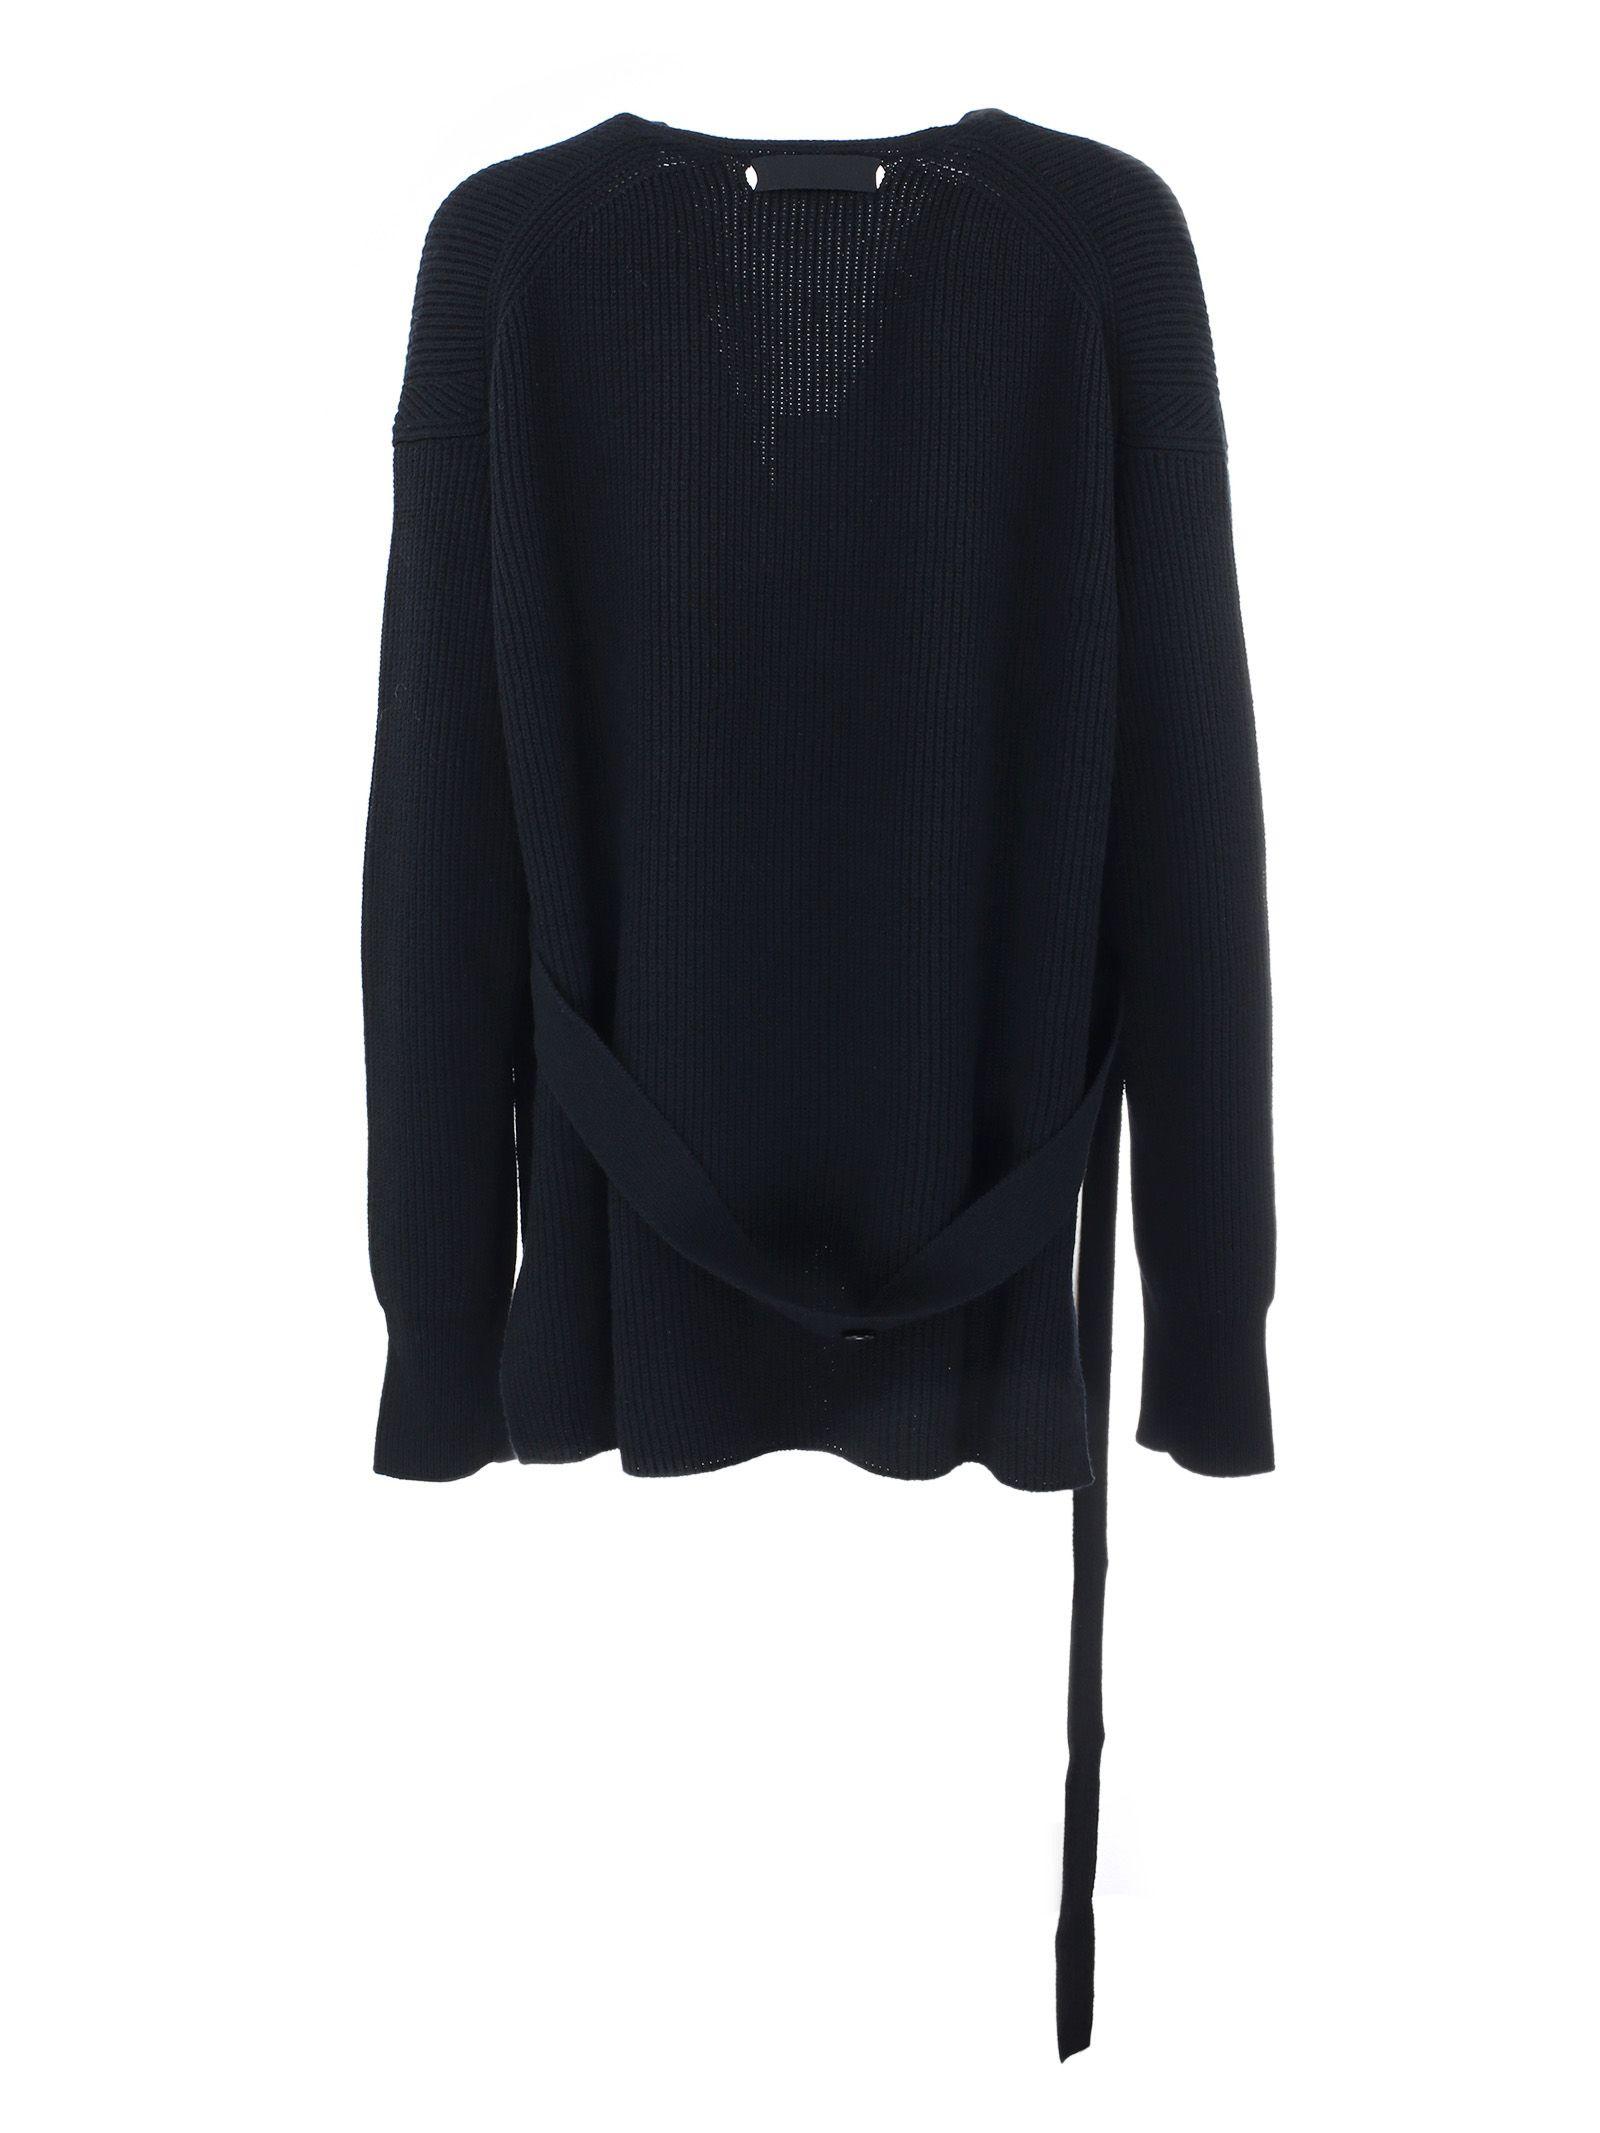 Helmut Lang - Helmut Lang Wrap Cardigan - Black, Women's Sweaters ...